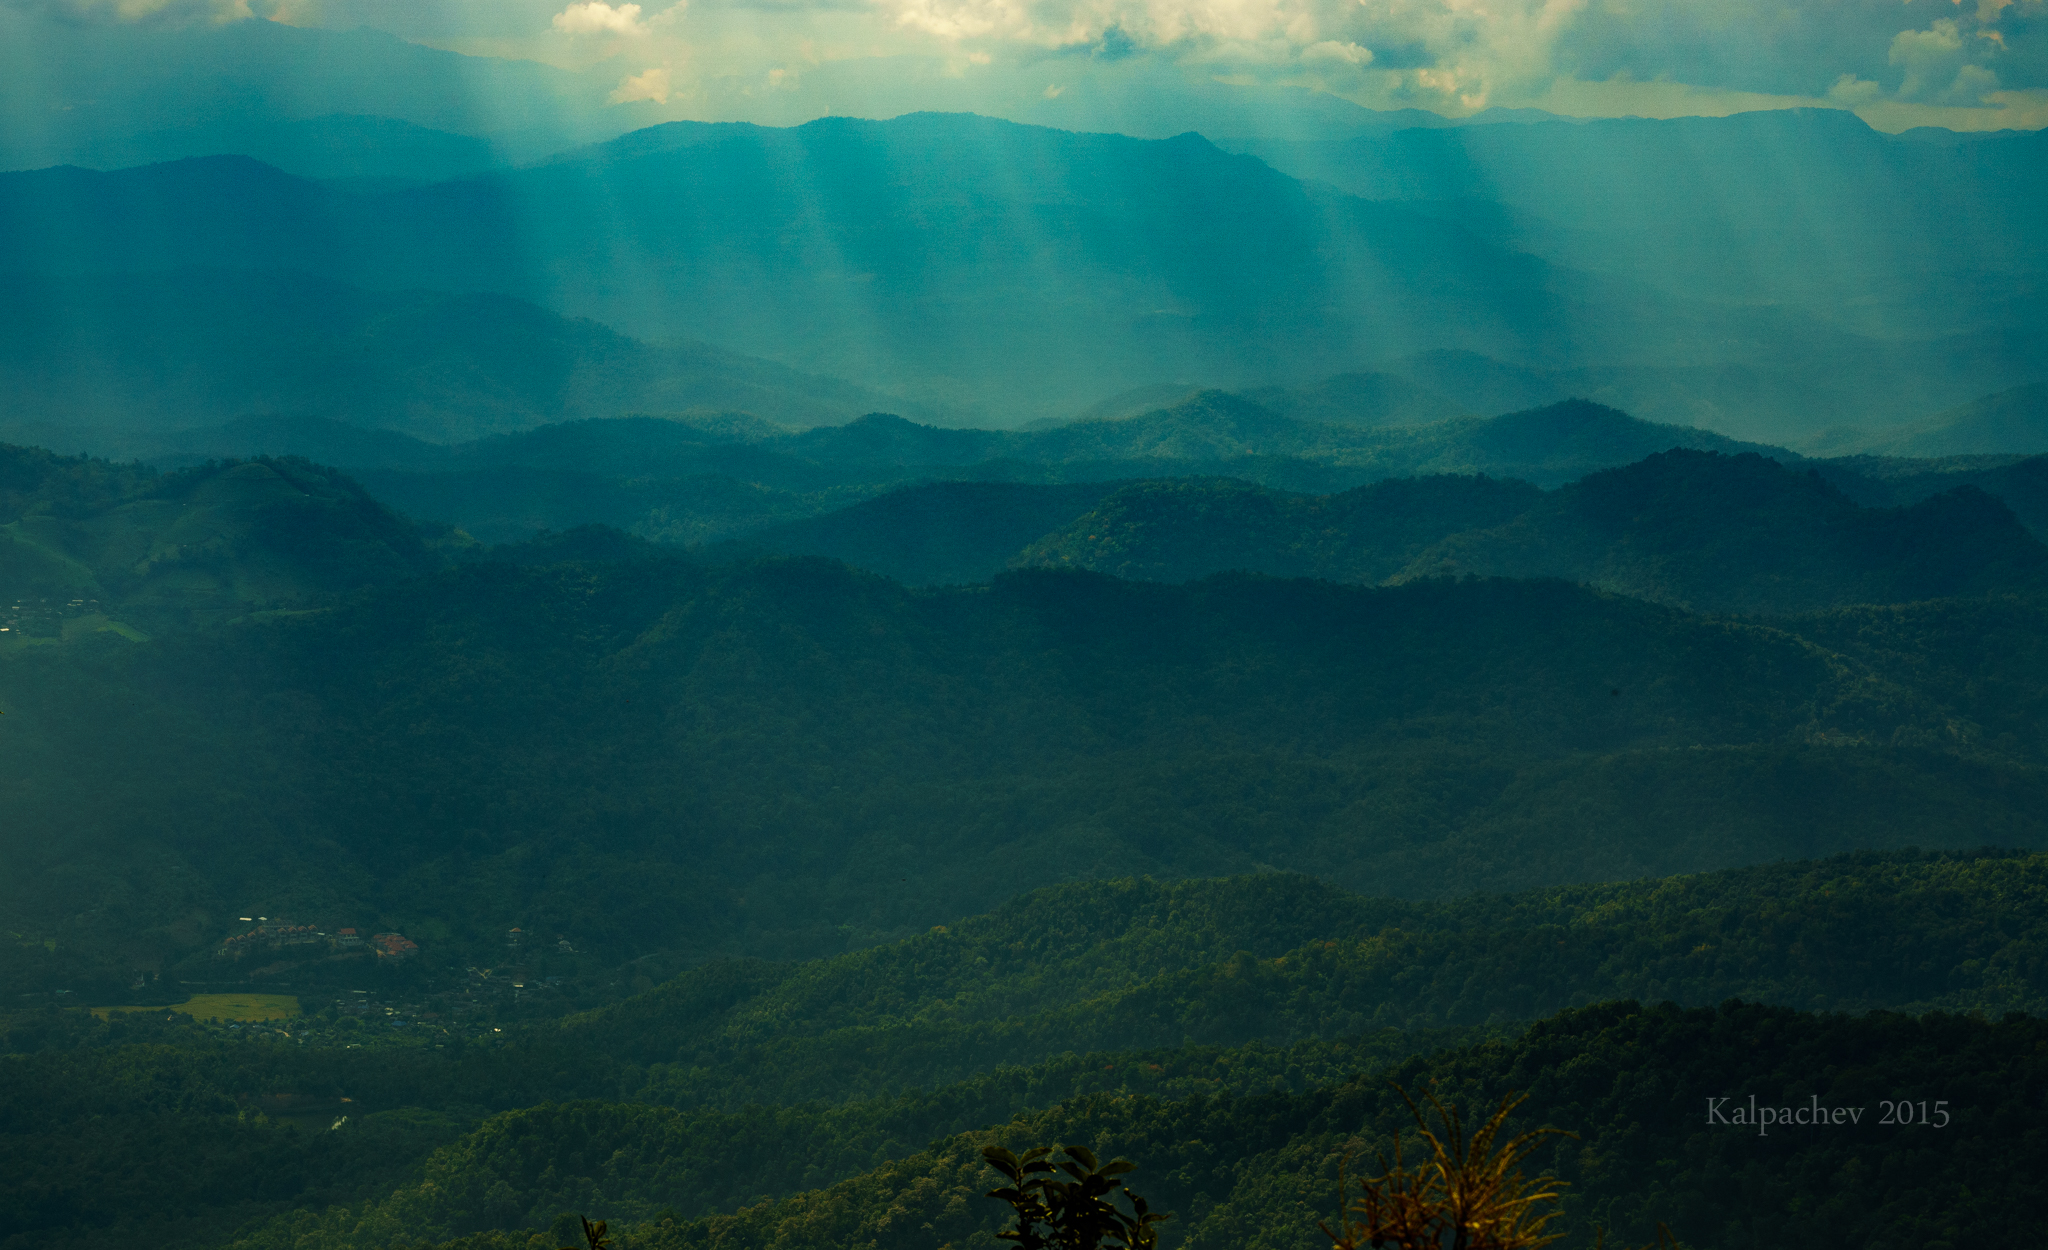 The magic of Chiang Mai